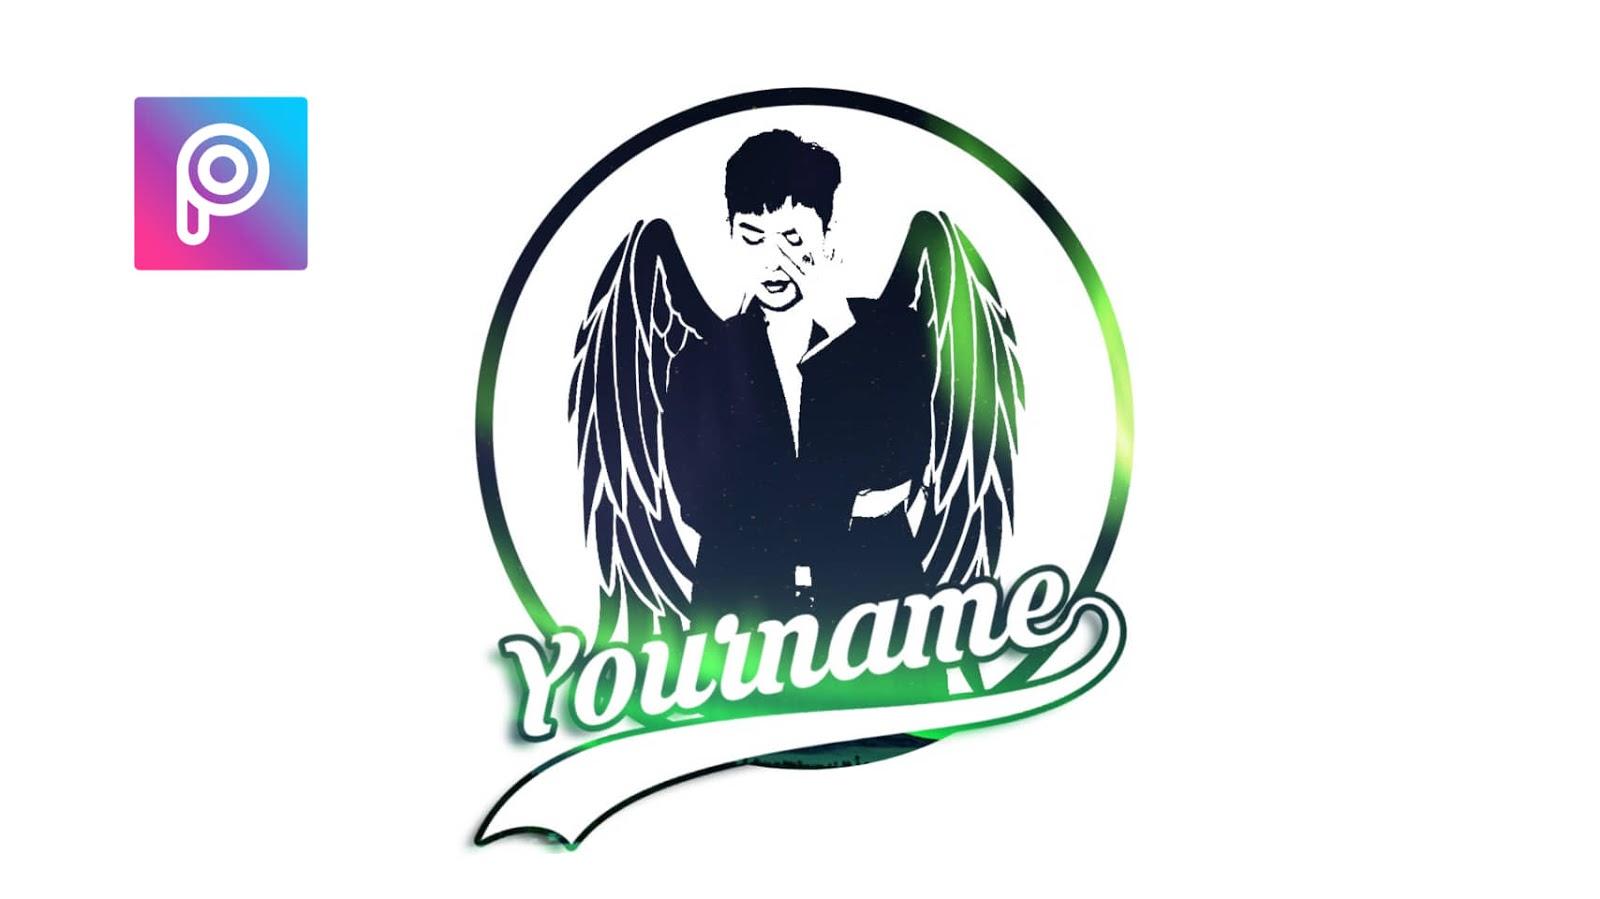 Your angel logo design Andriod - Editing Tricks